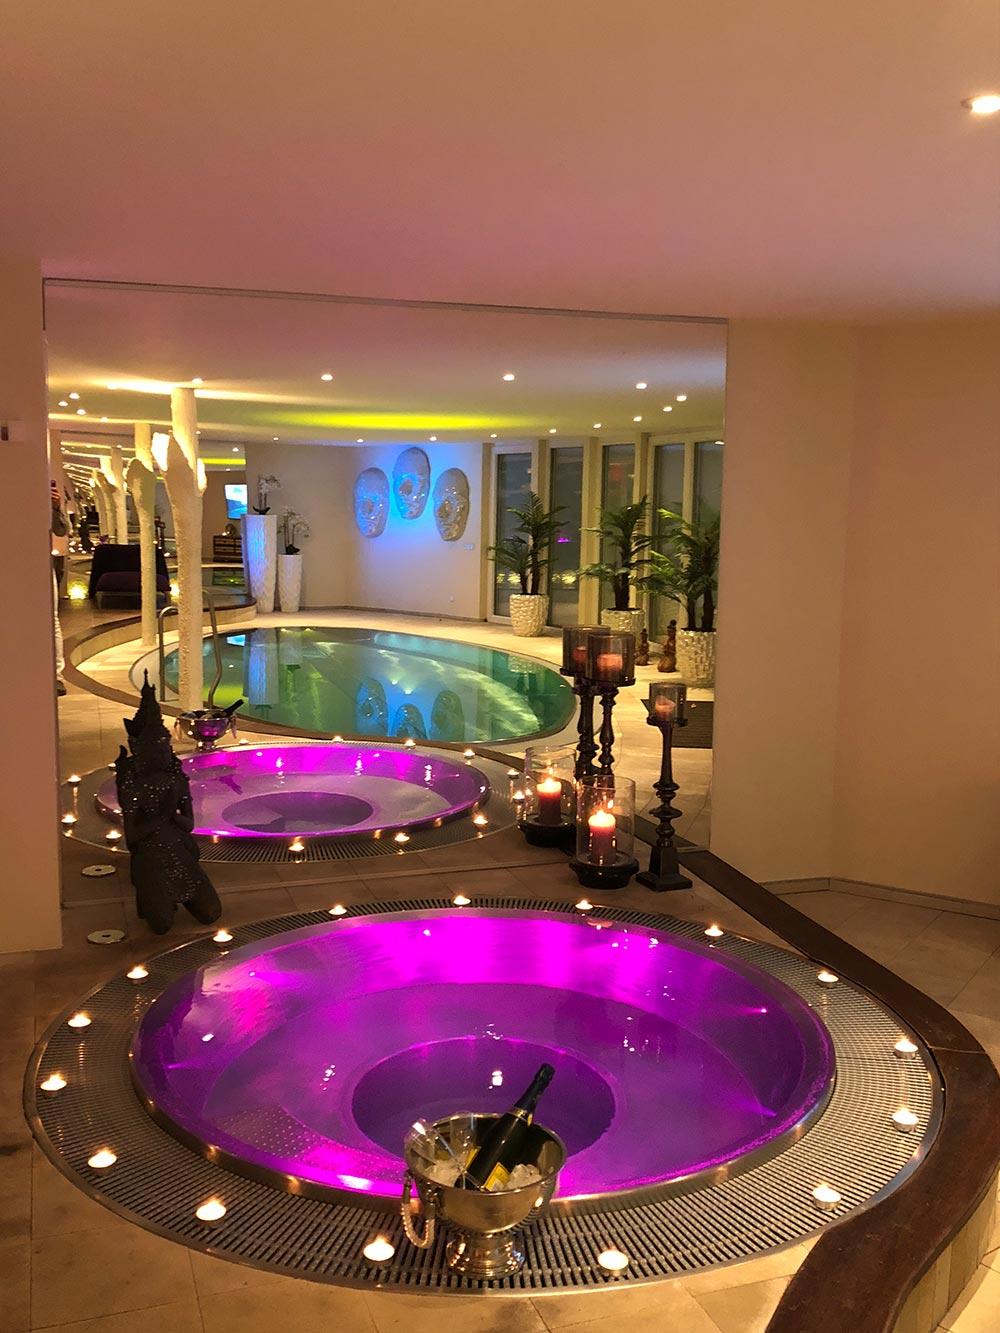 wellness-privat-spa-stuttgart-12 - LuxFit Private SPA, Wellness ...